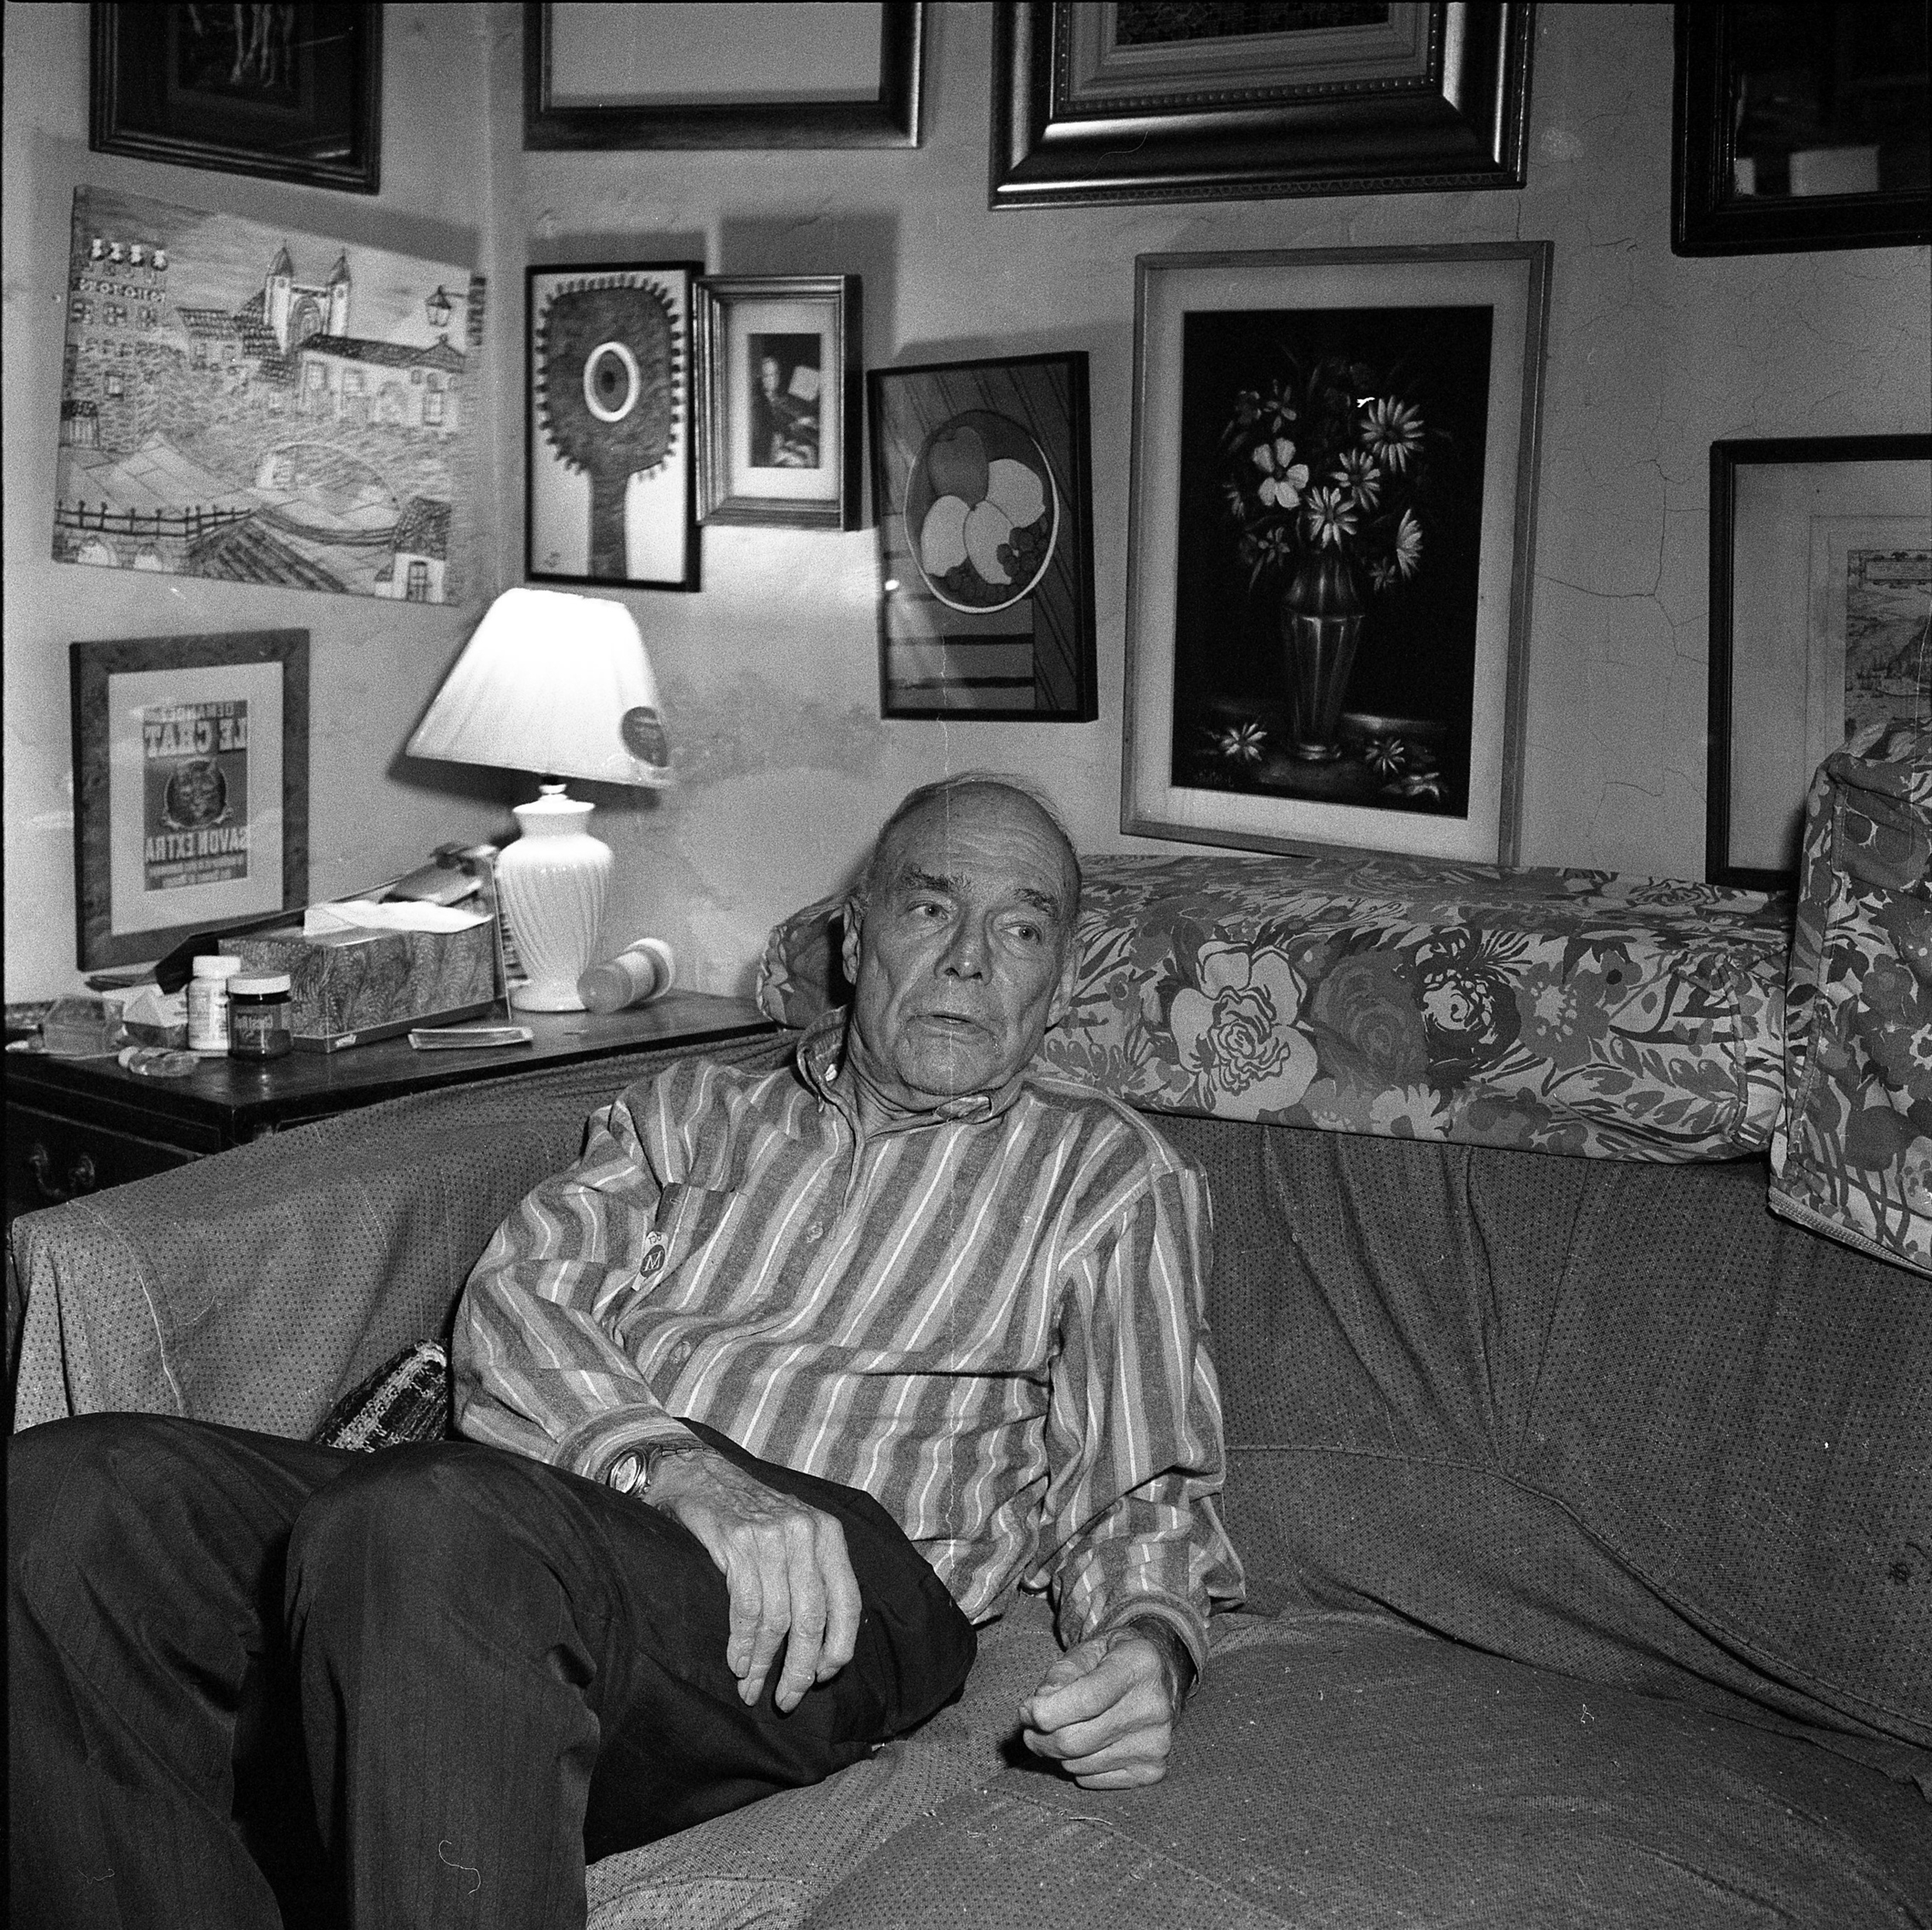 Mr. New York  circa 1950